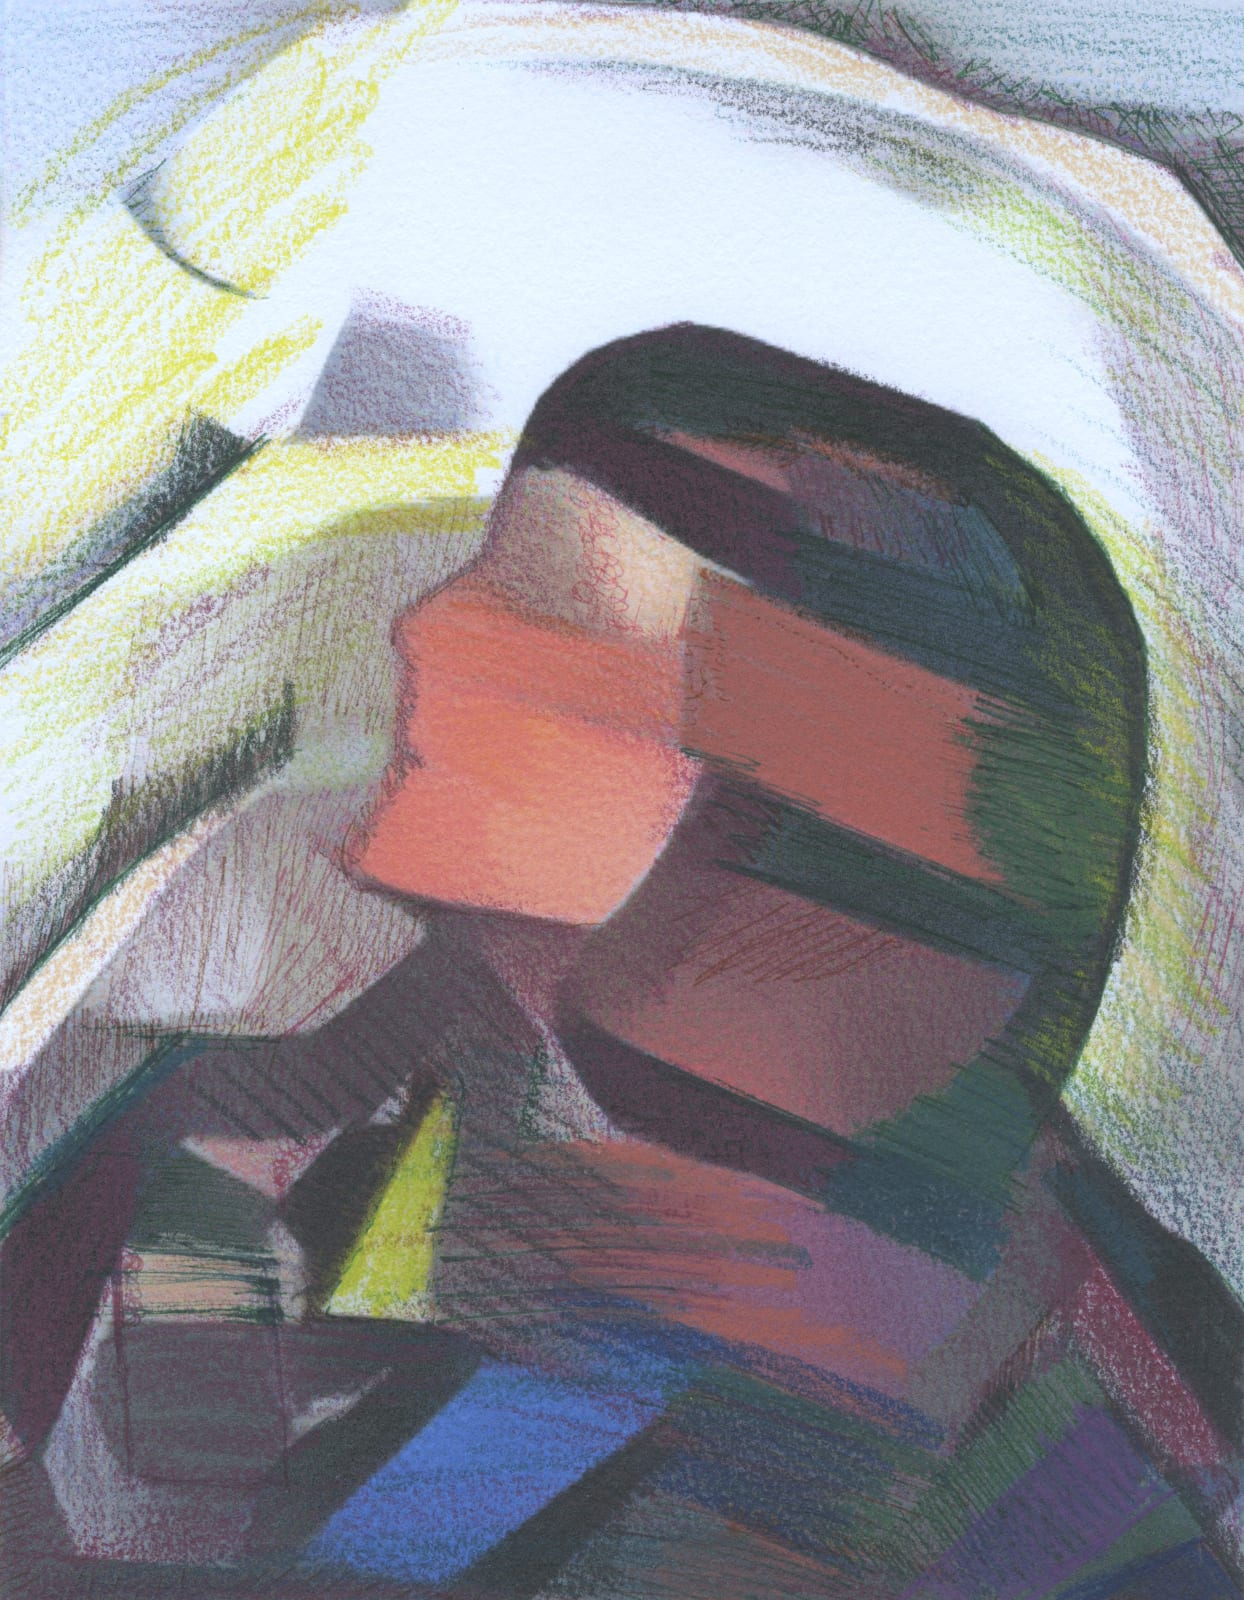 Pamela Davis Kivelson, #21 Symplectic Geometry/Dusa McDuff, 2019